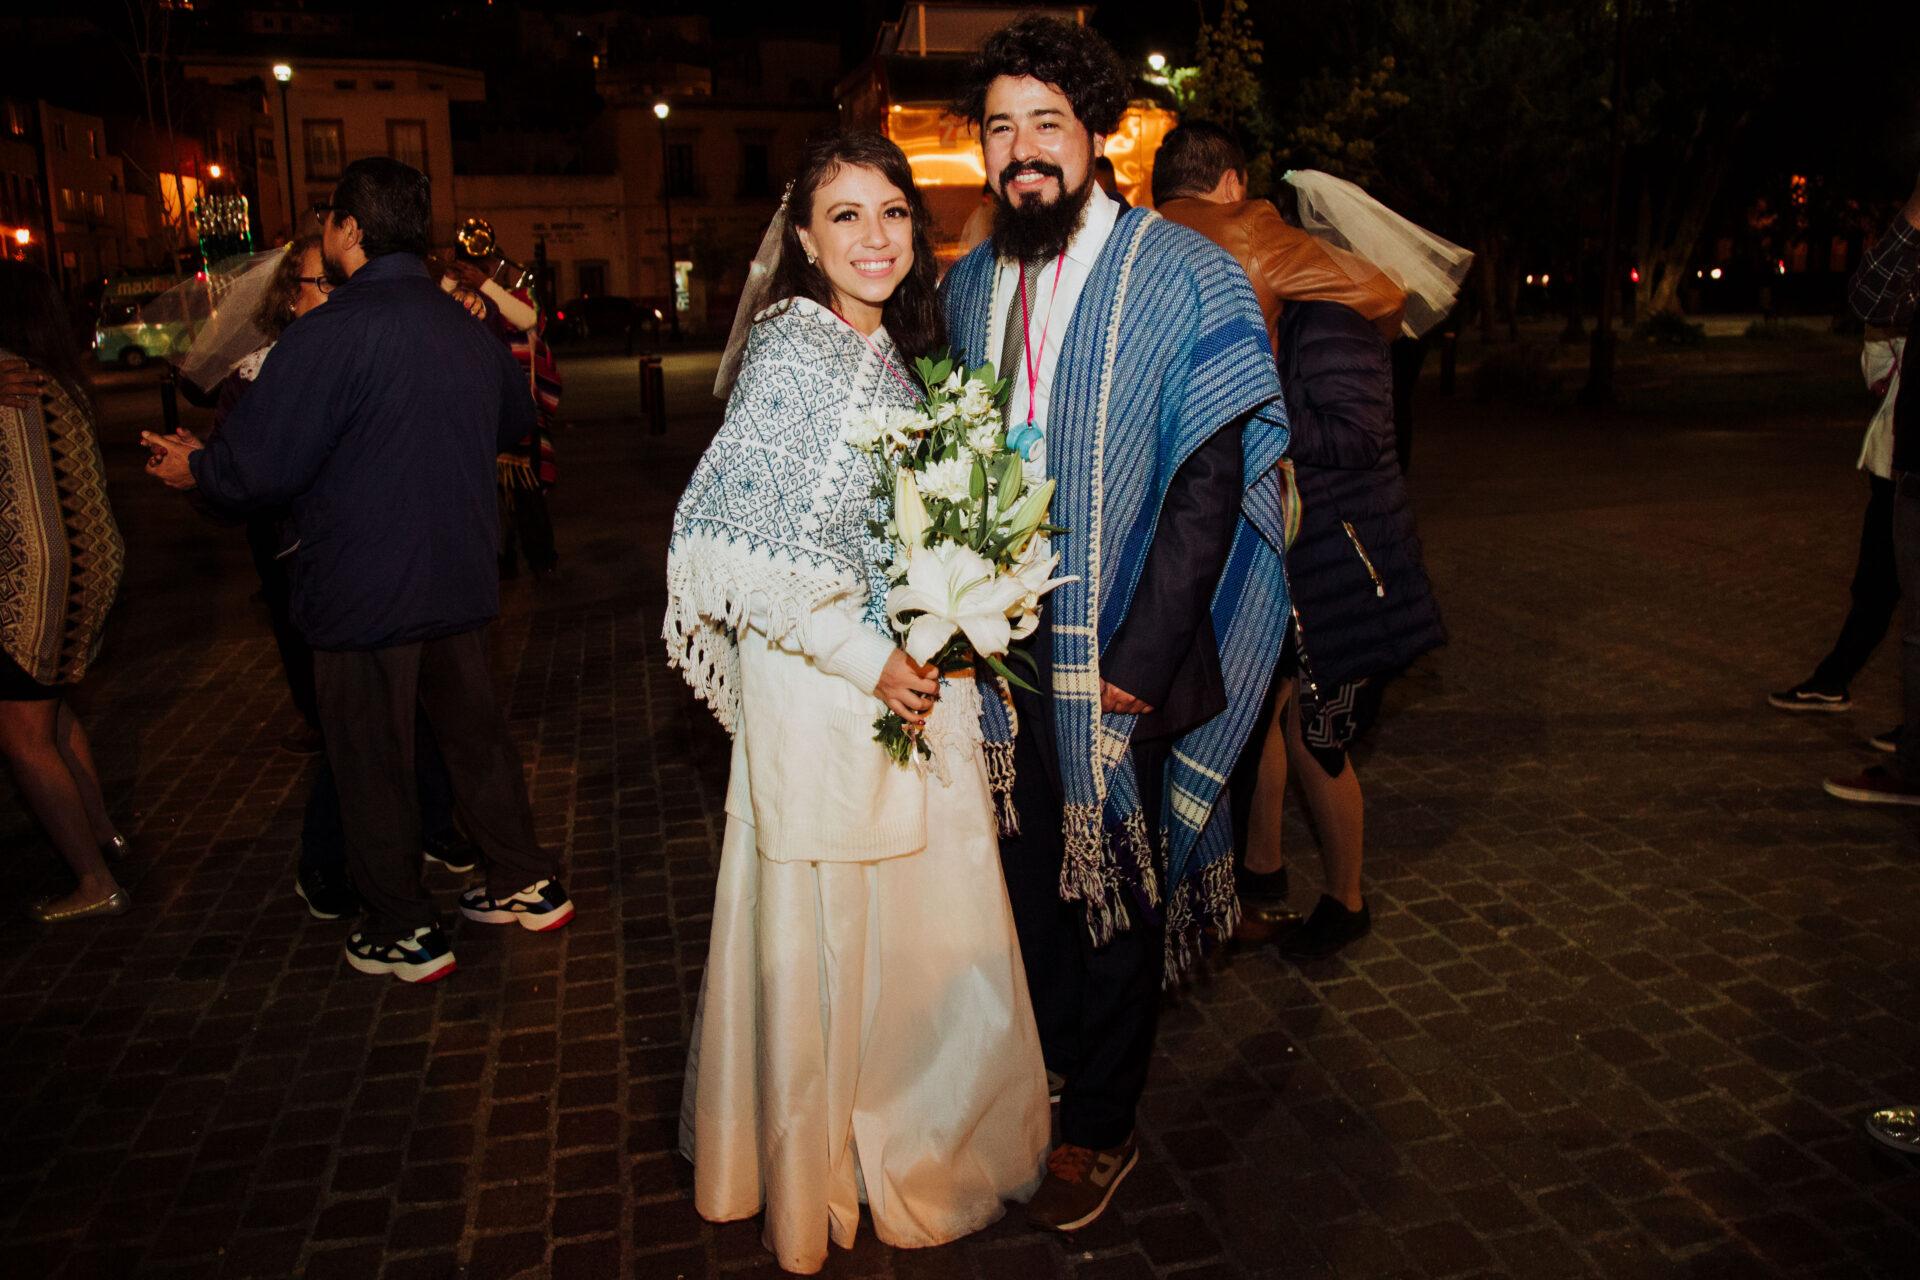 javier_noriega_fotografo_bodas_la_mina_club_zacatecas_wedding_photographer39